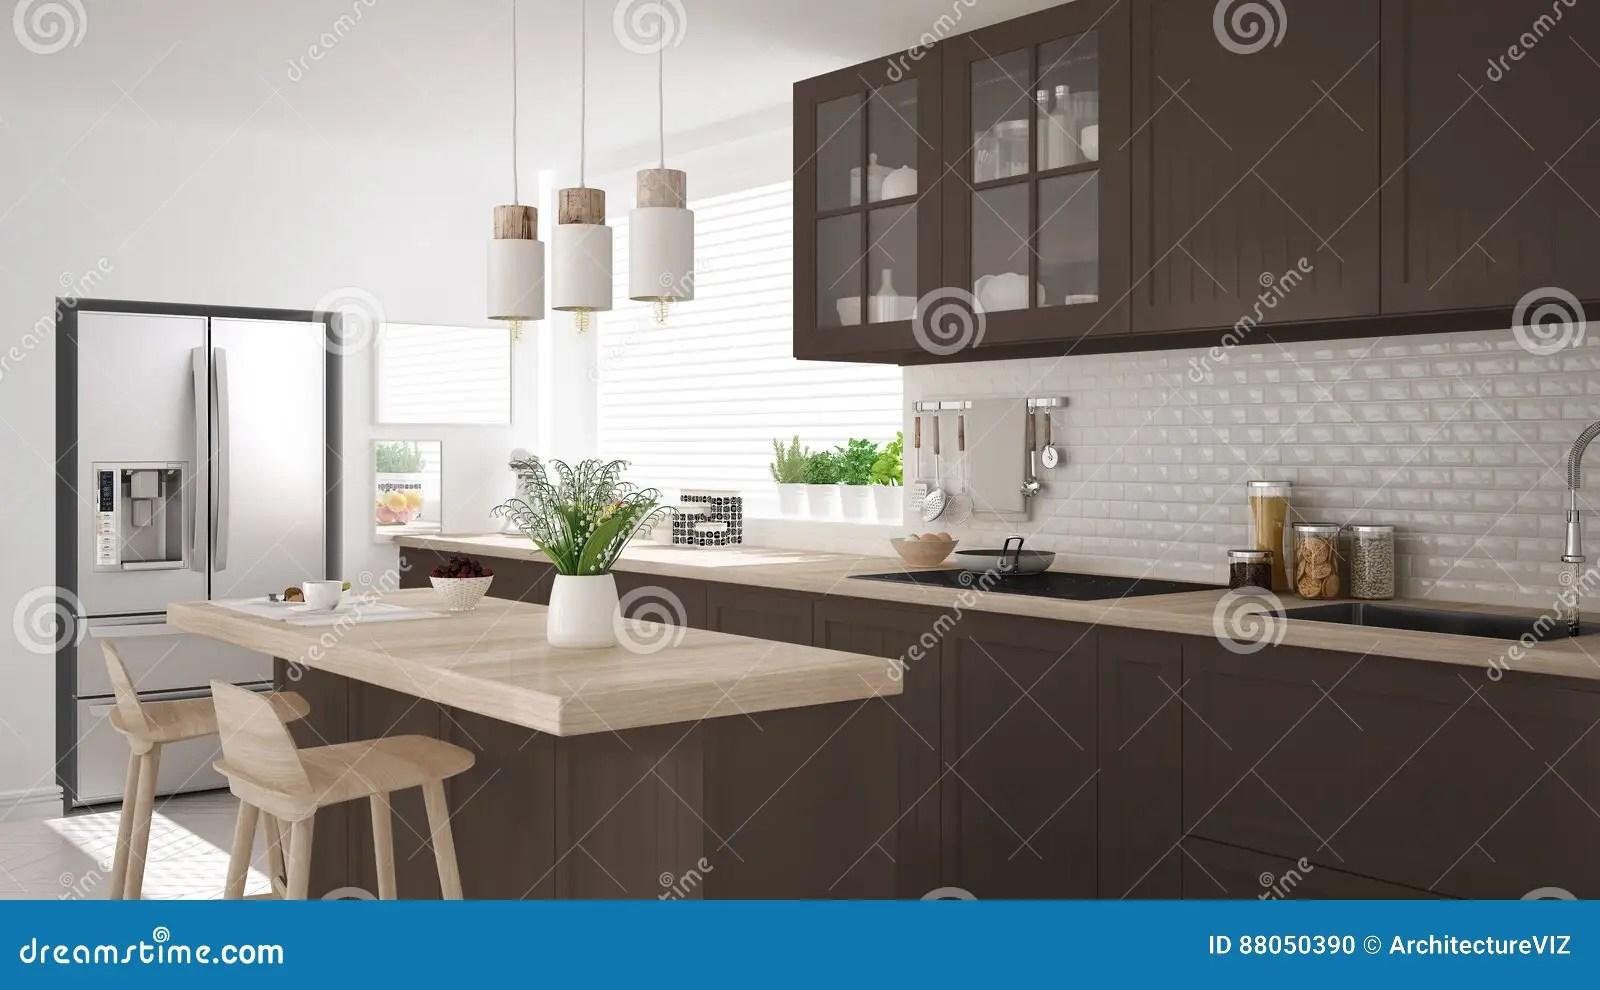 kitchen miniature mobile home sink 有木和棕色细节的斯堪的纳维亚经典厨房 微型库存例证 插画包括有当代 有木和棕色细节的 minimalistic室内设计斯堪的纳维亚经典厨房